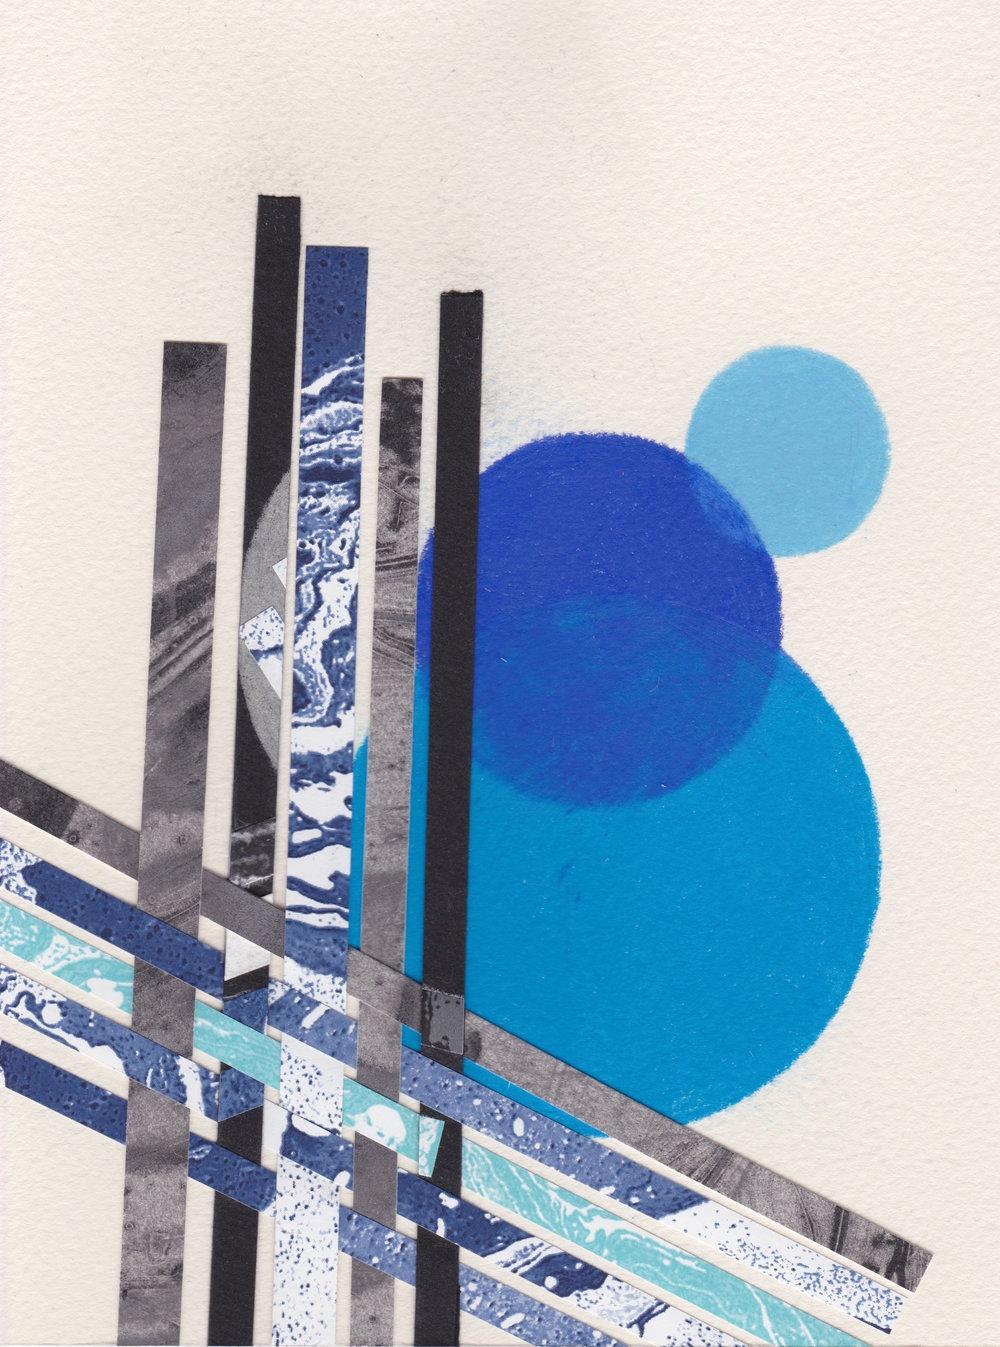 Blue Moons #8